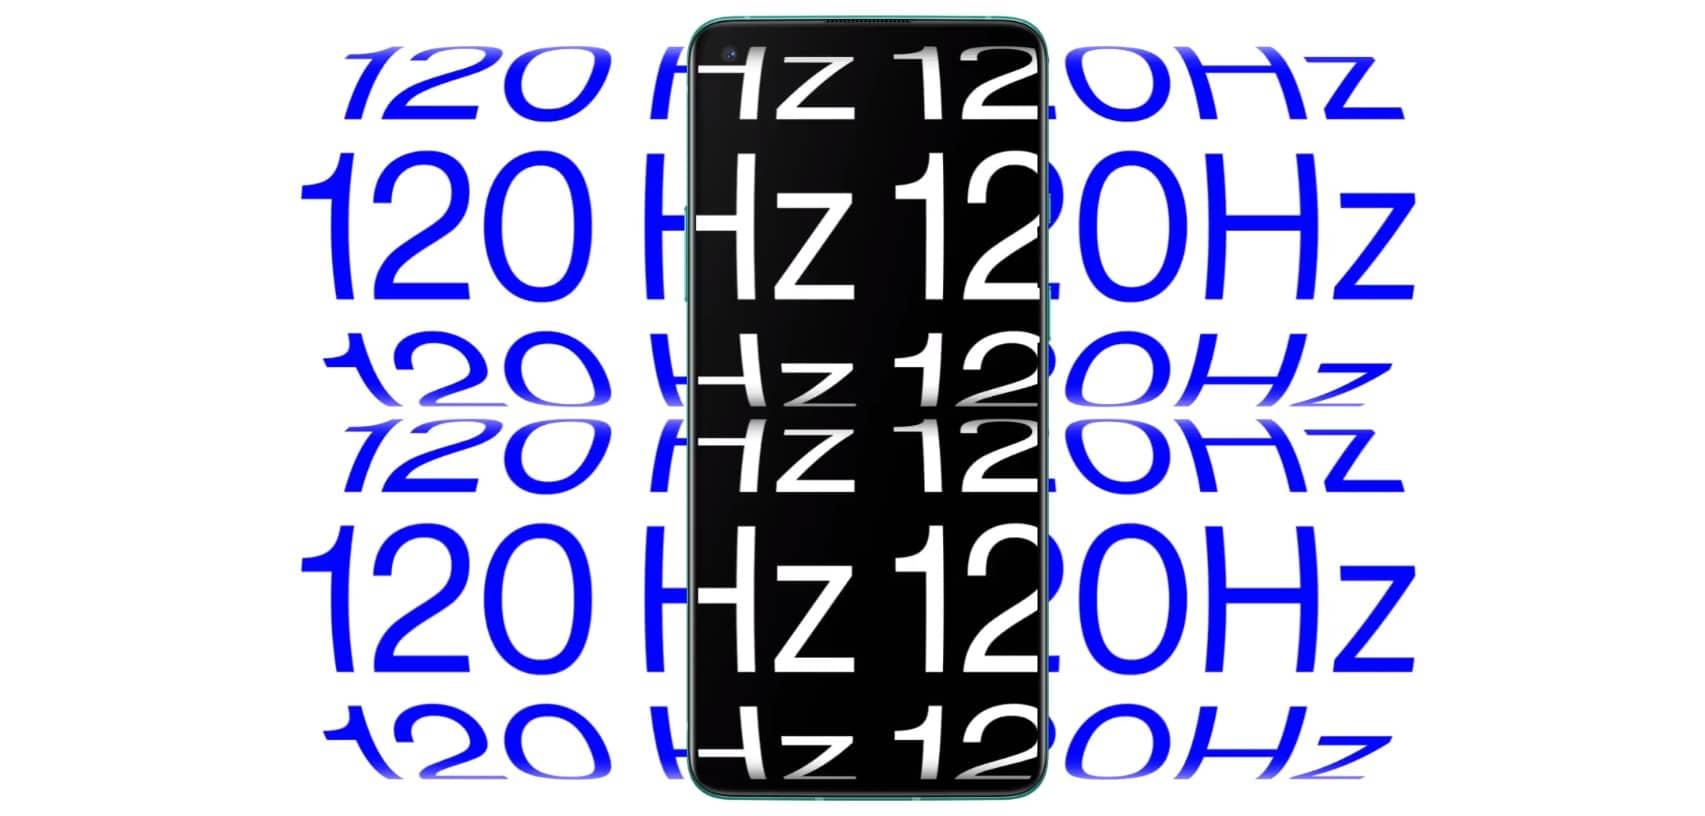 OnePlus 8T дисплей 120 герц